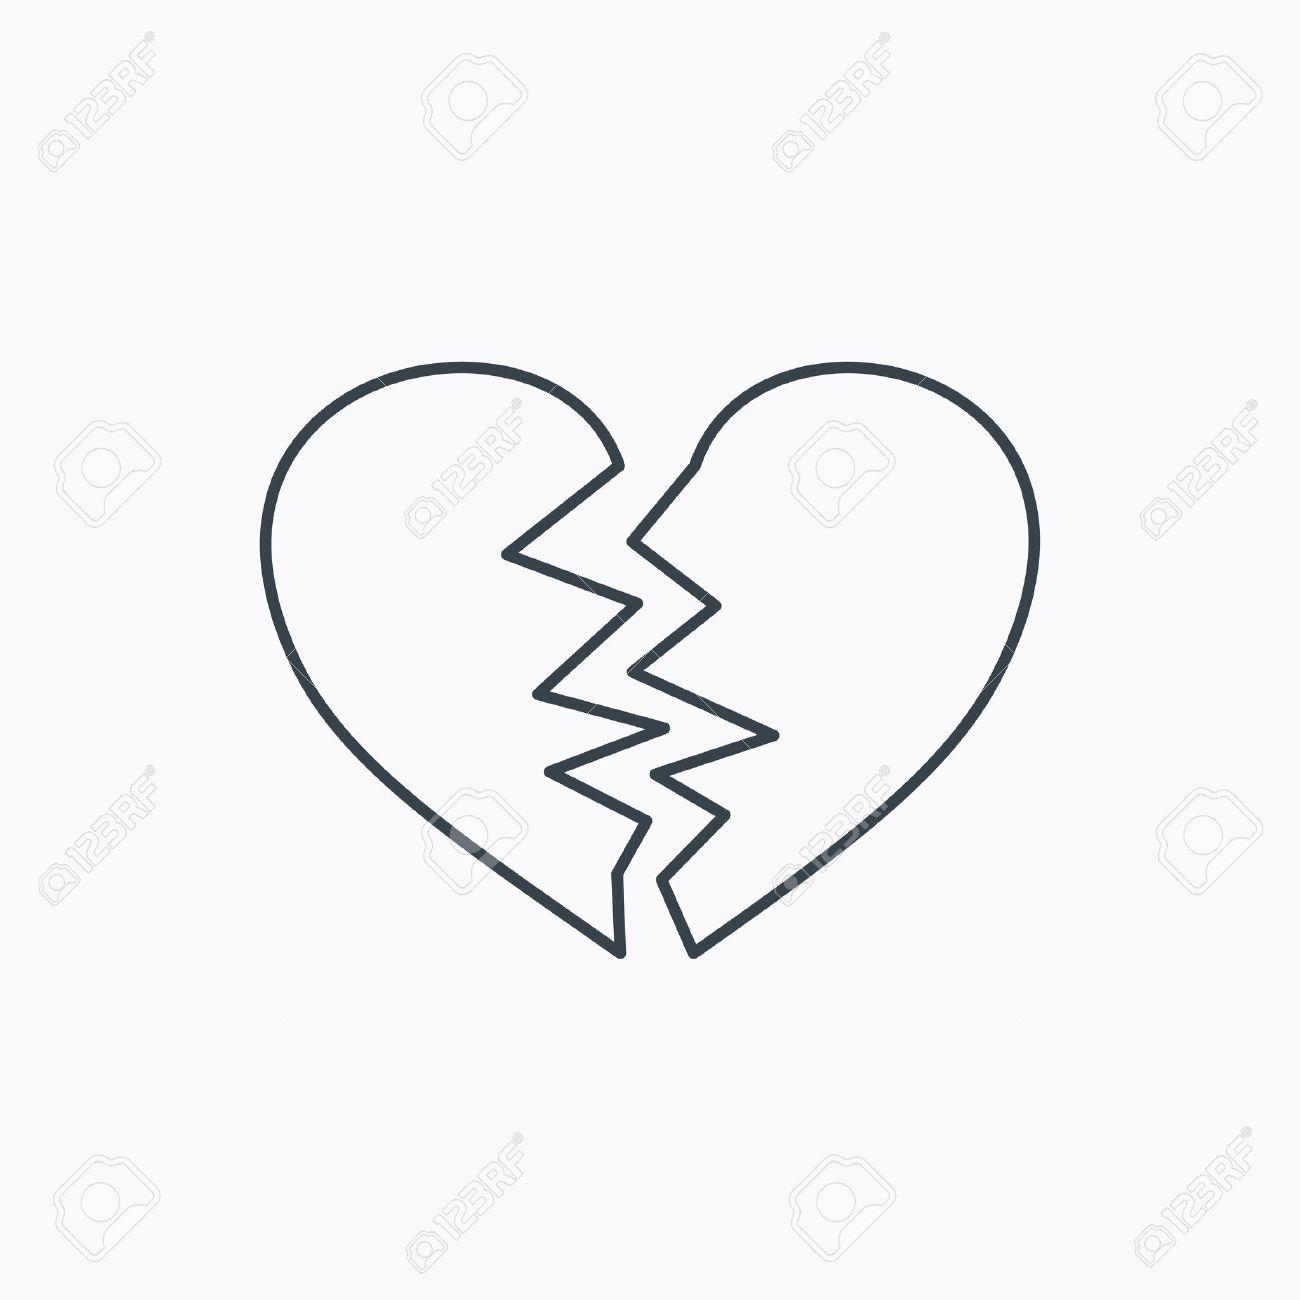 broken heart icon divorce sign end of love symbol linear